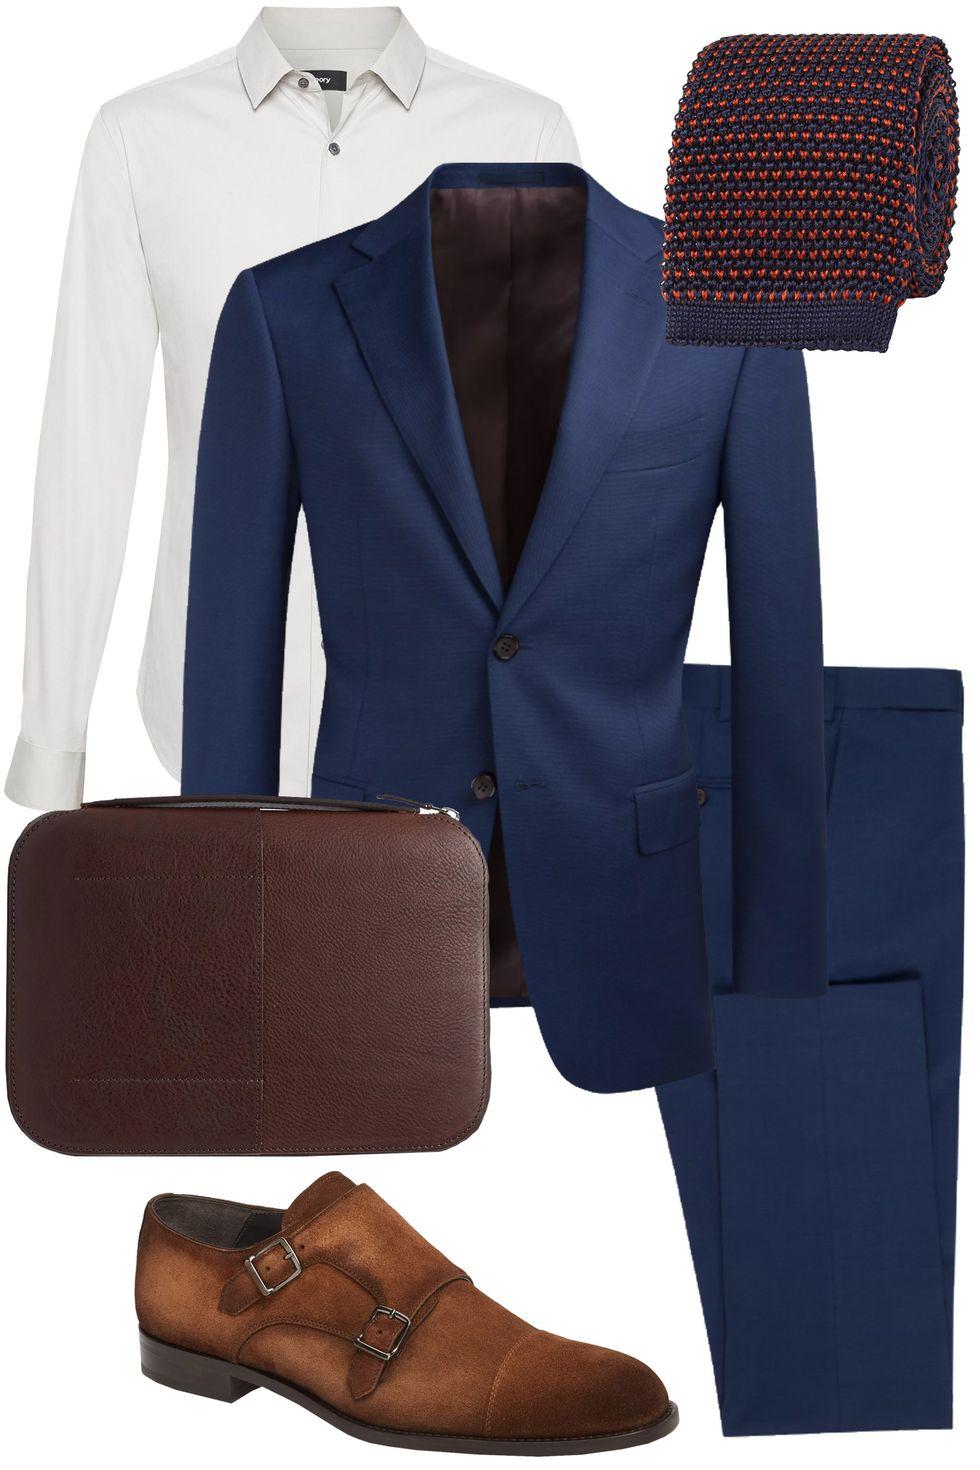 male fashion for fall 2018